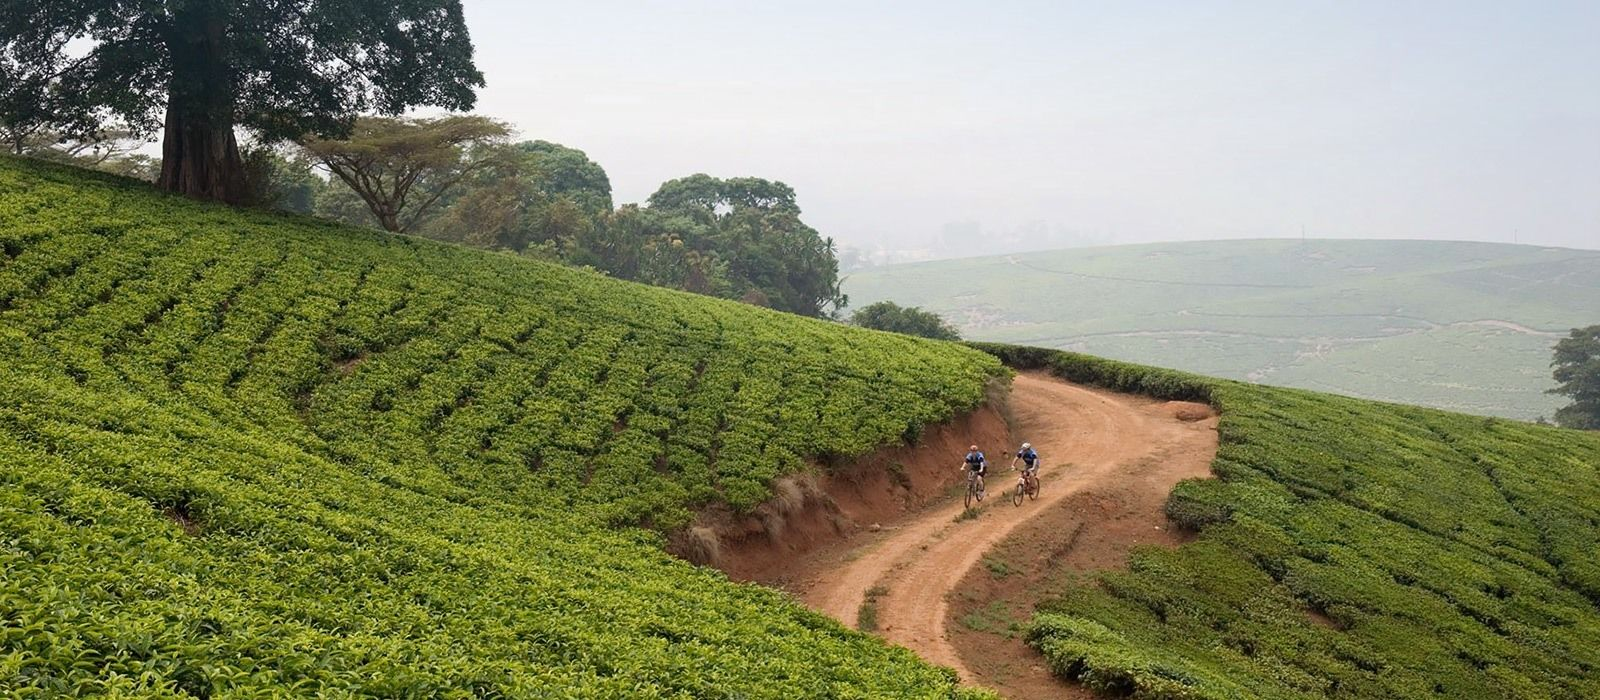 Malawi Rundreise: Natur, Safari und Lake Malawi Urlaub 5